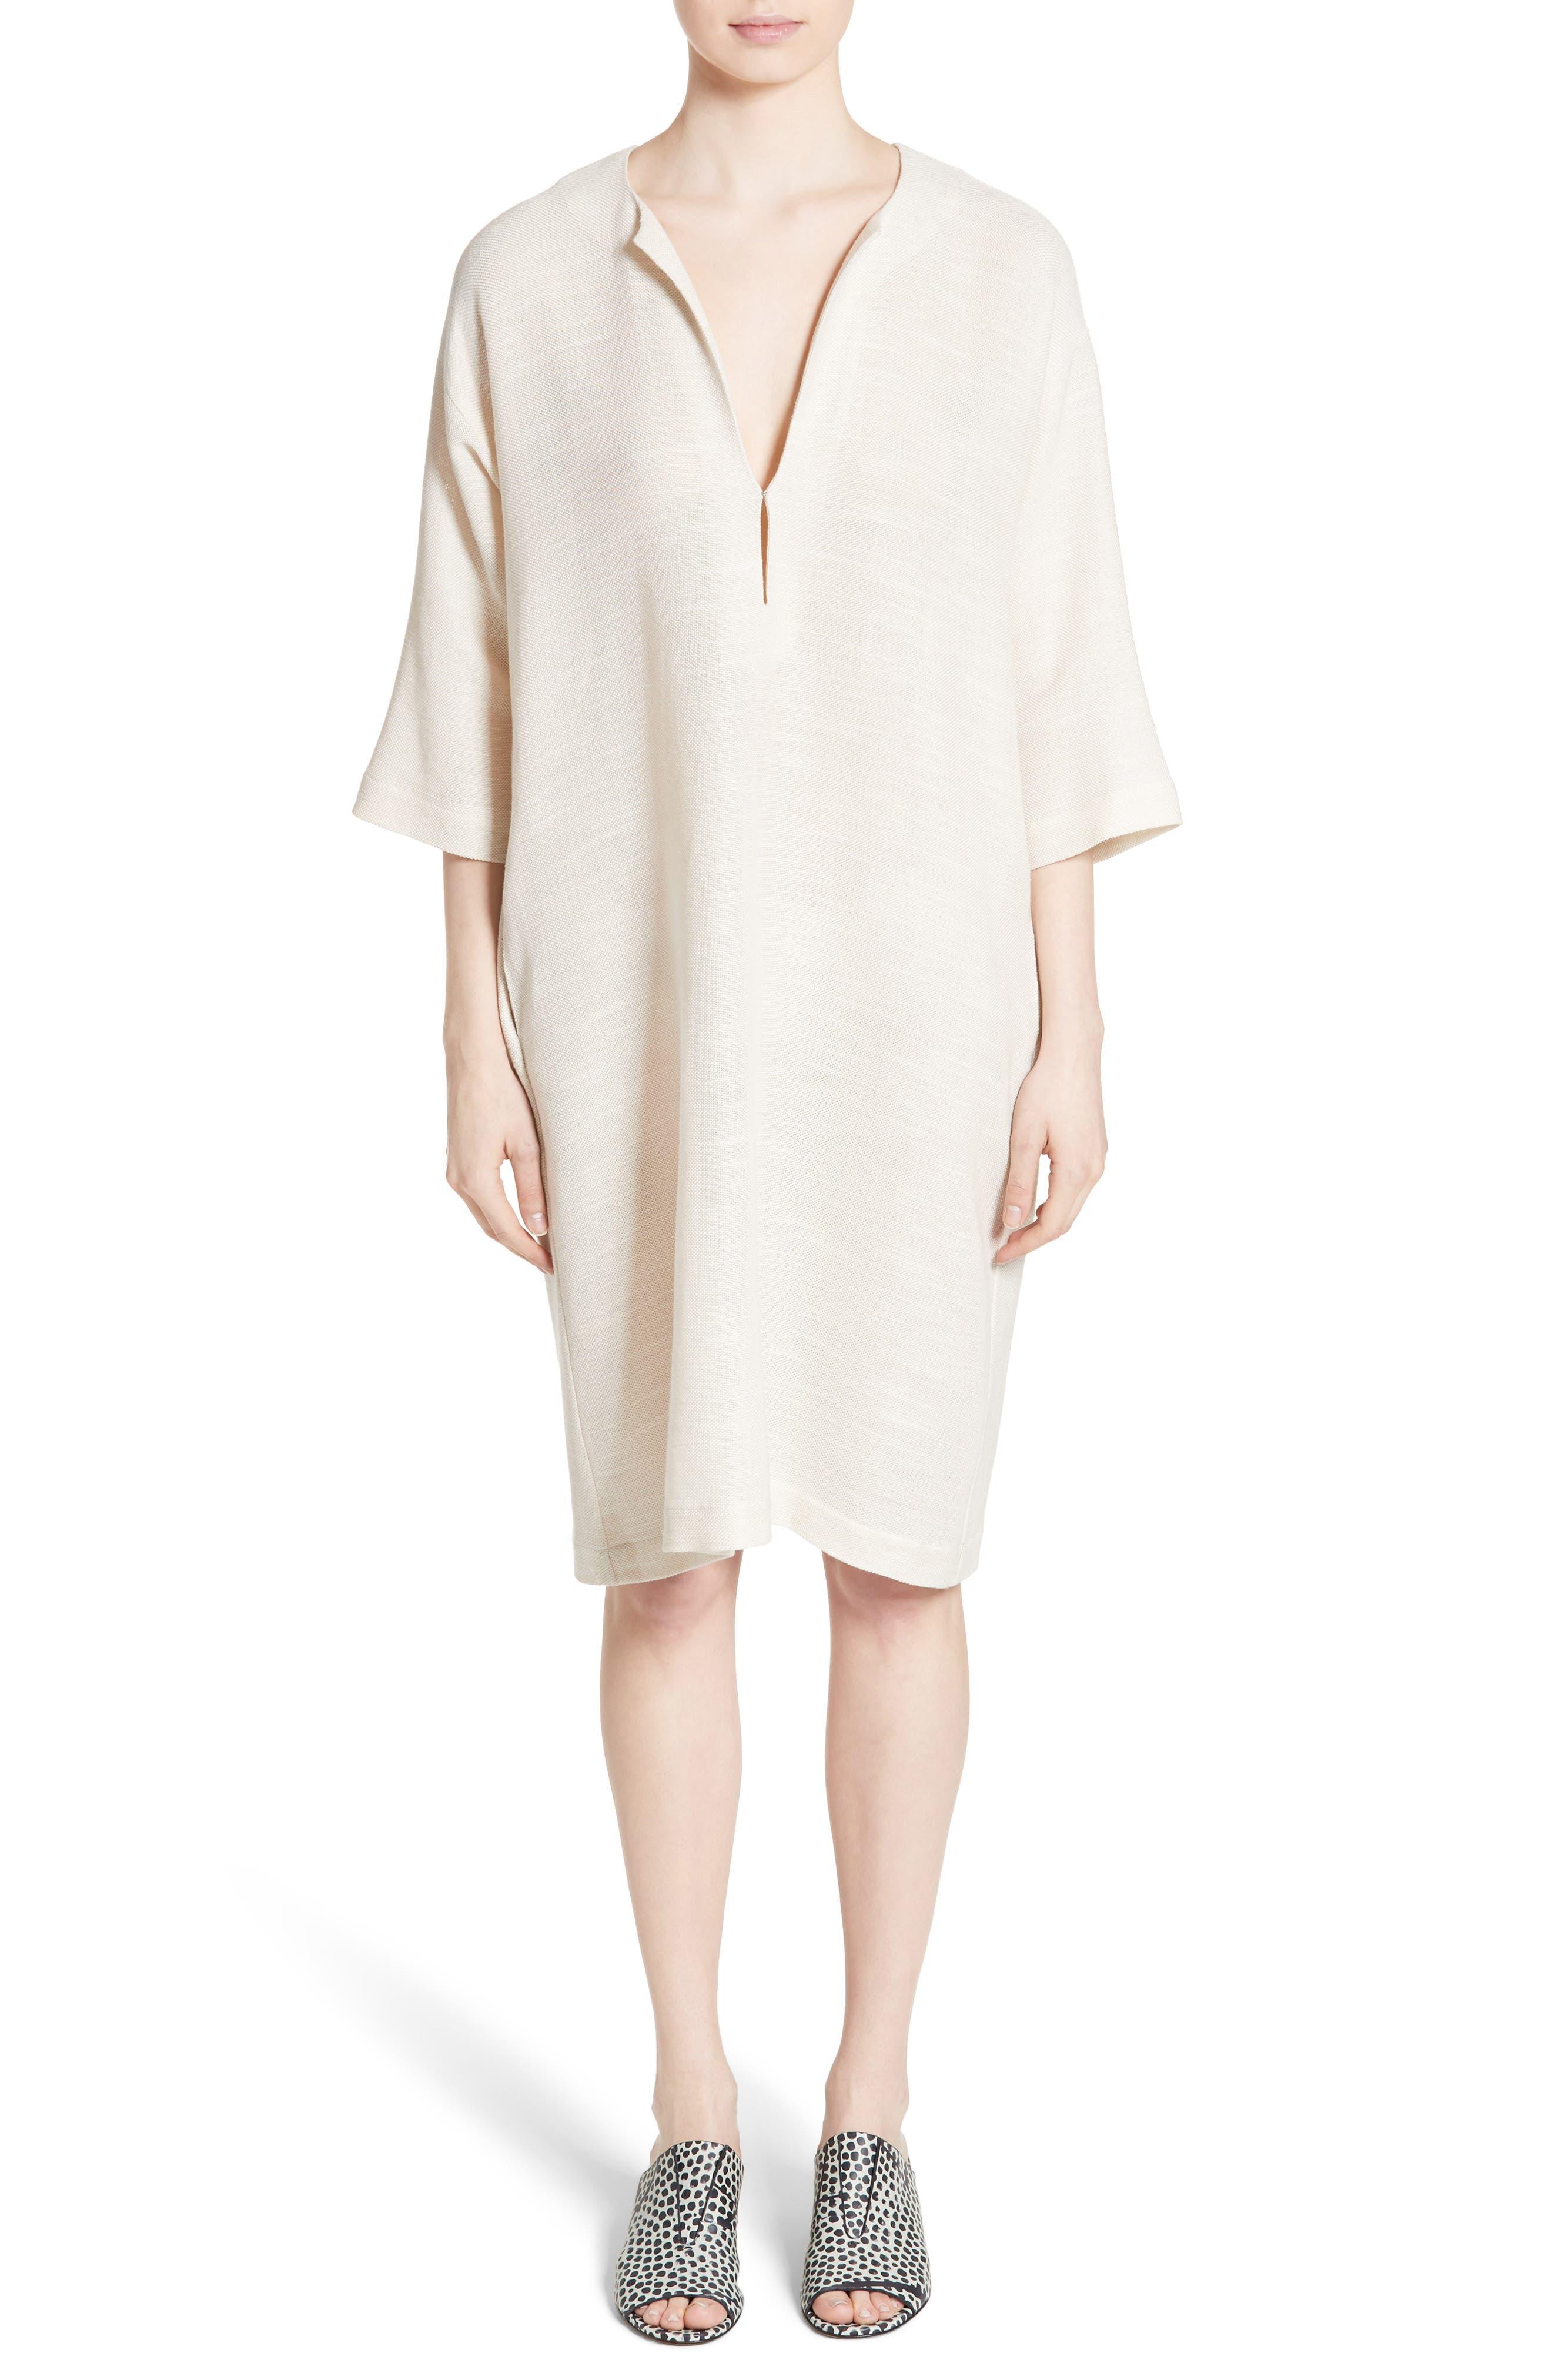 Alternate Image 1 Selected - Zero + Maria Cornejo MC Mesh Drape Dress